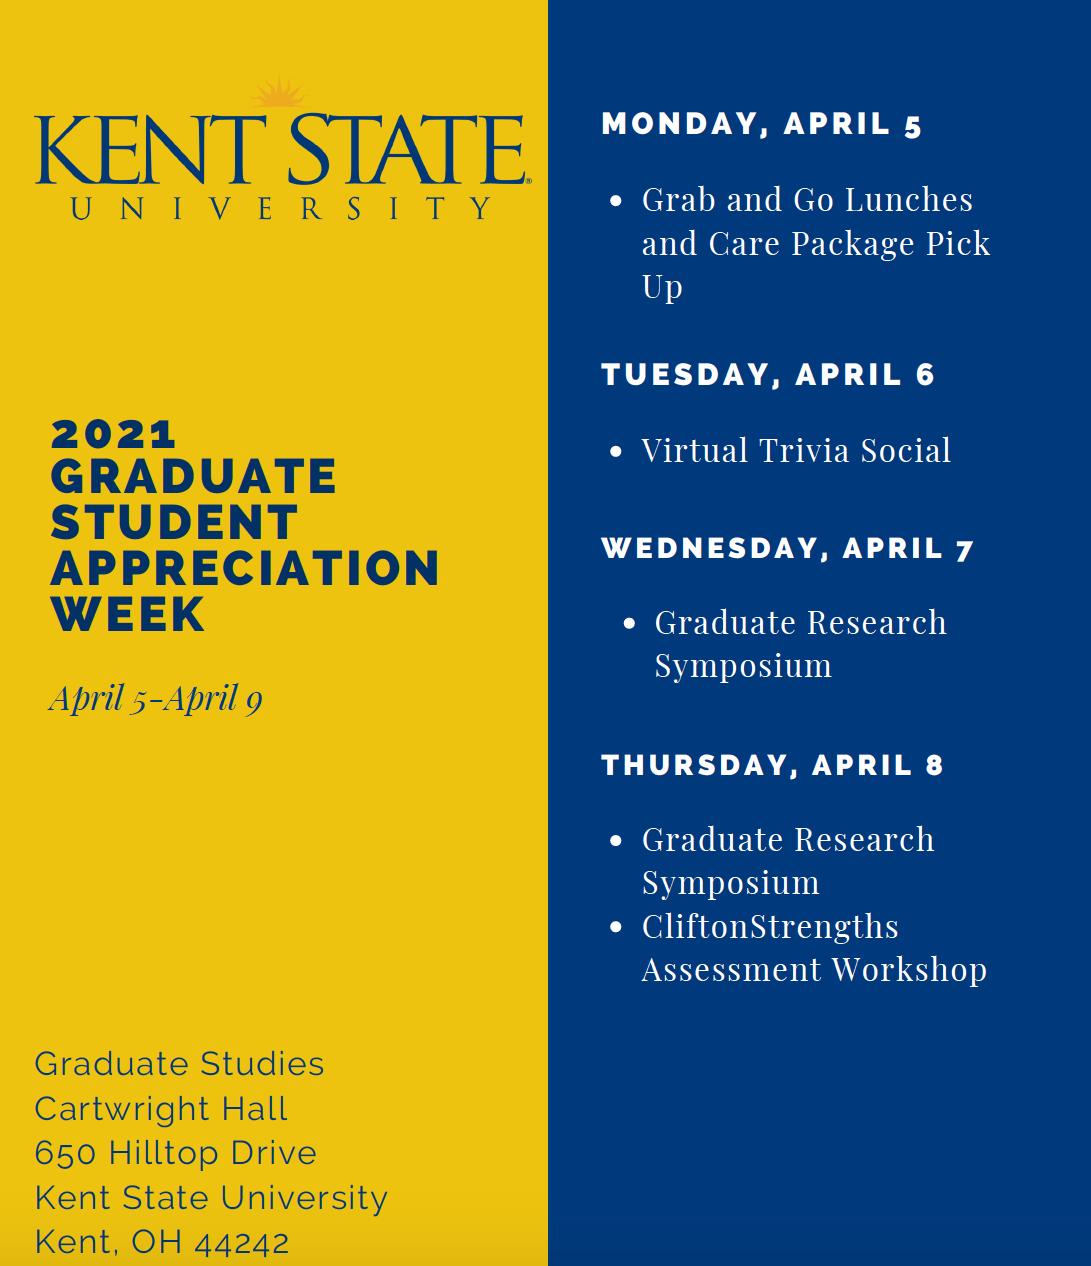 2021 Graduate Student Appreciation Week Schedule